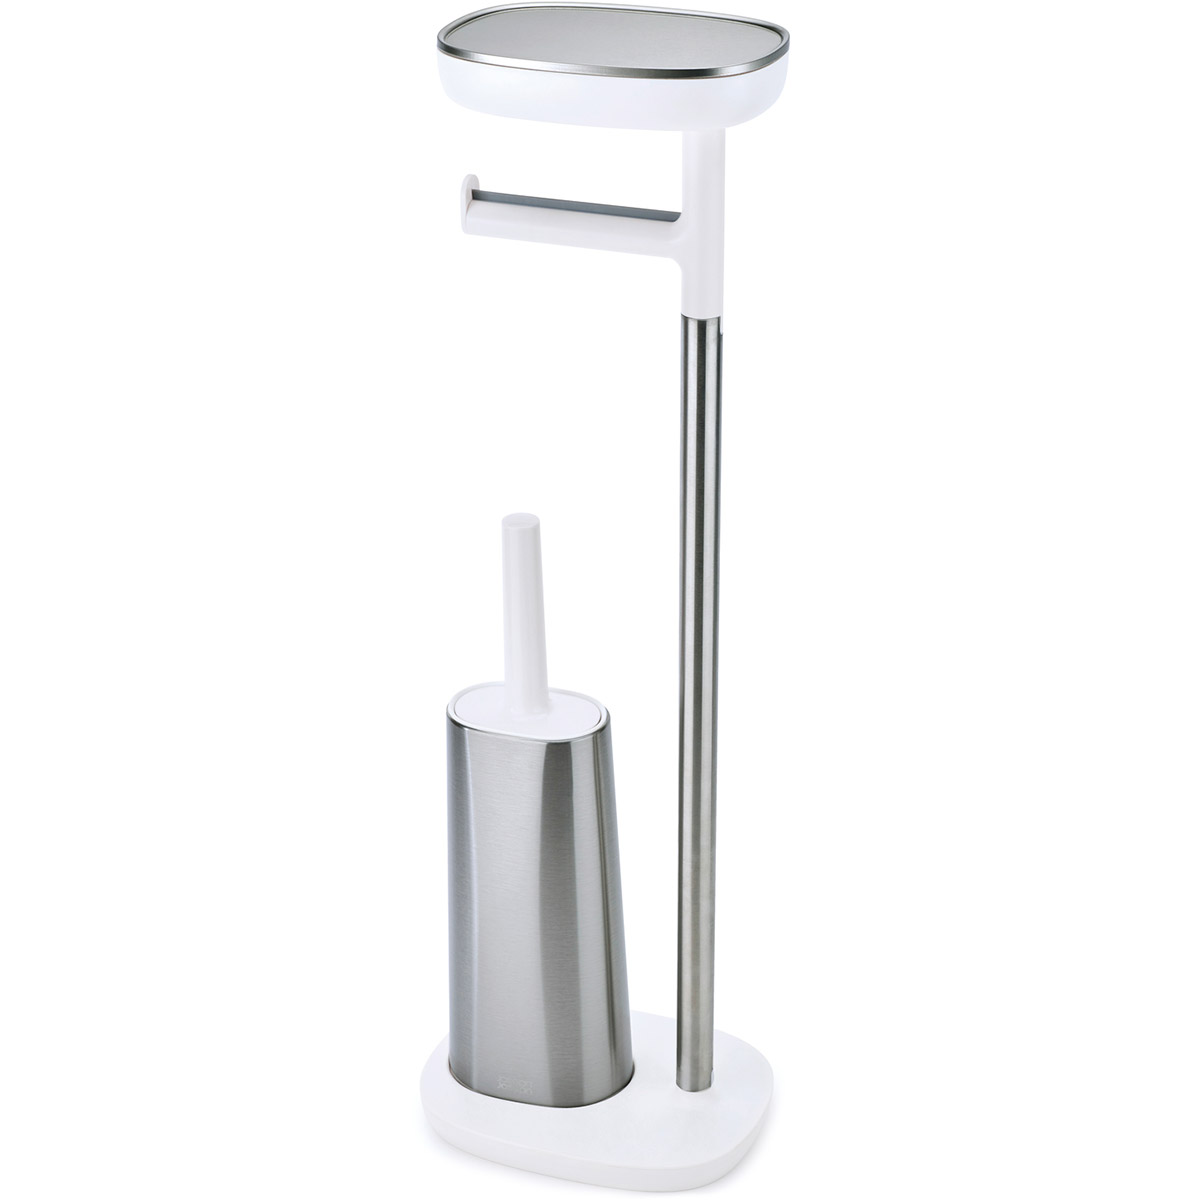 Stojak Na Papier Toaletowy Szczotka Toaletowa Easystore Plus Joseph